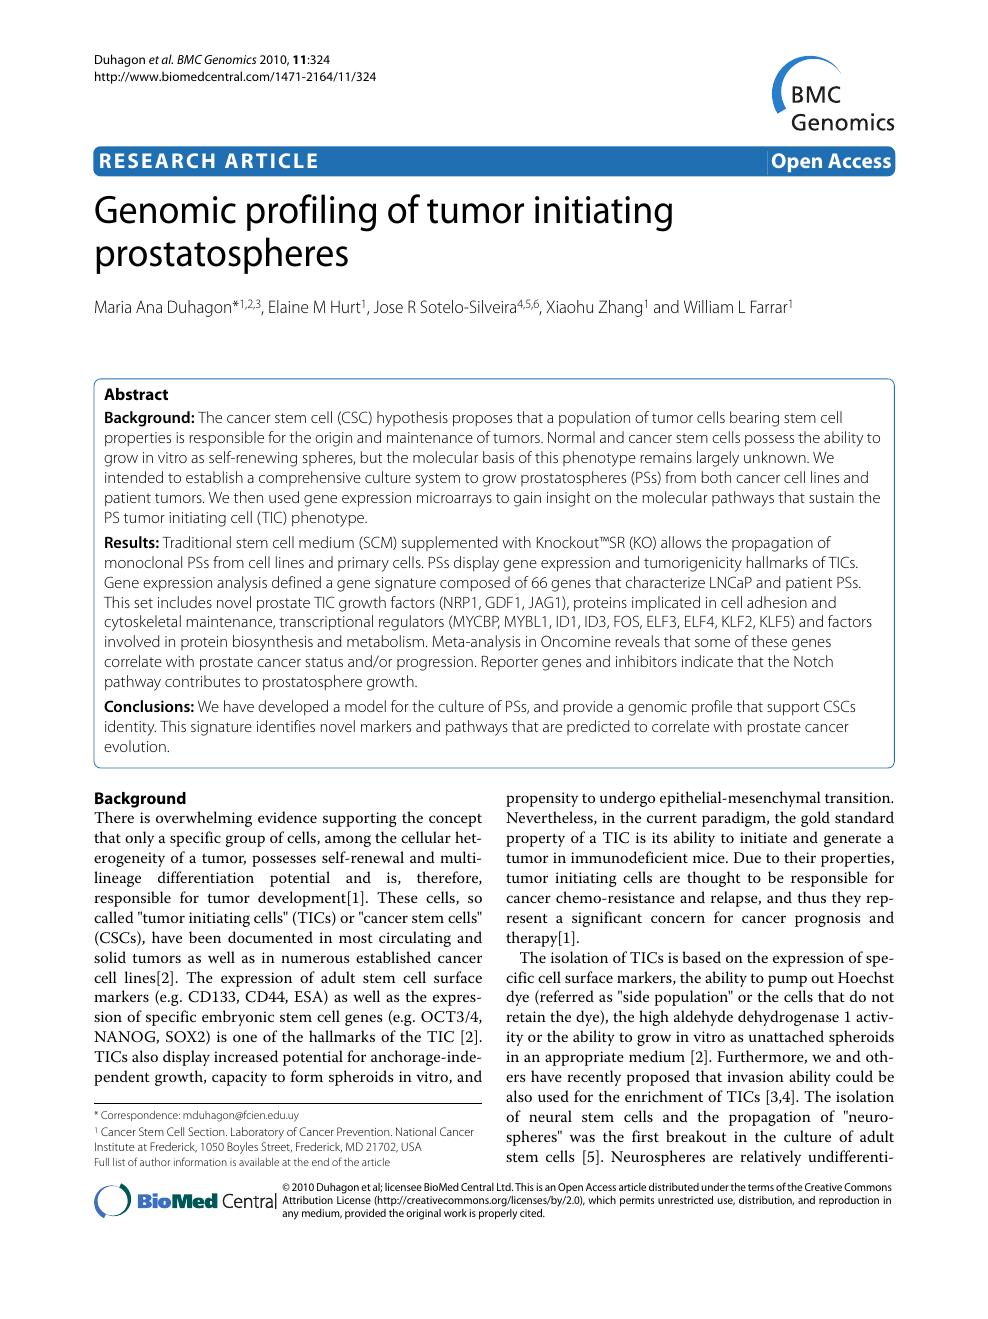 Genomic profiling of tumor initiating prostatospheres